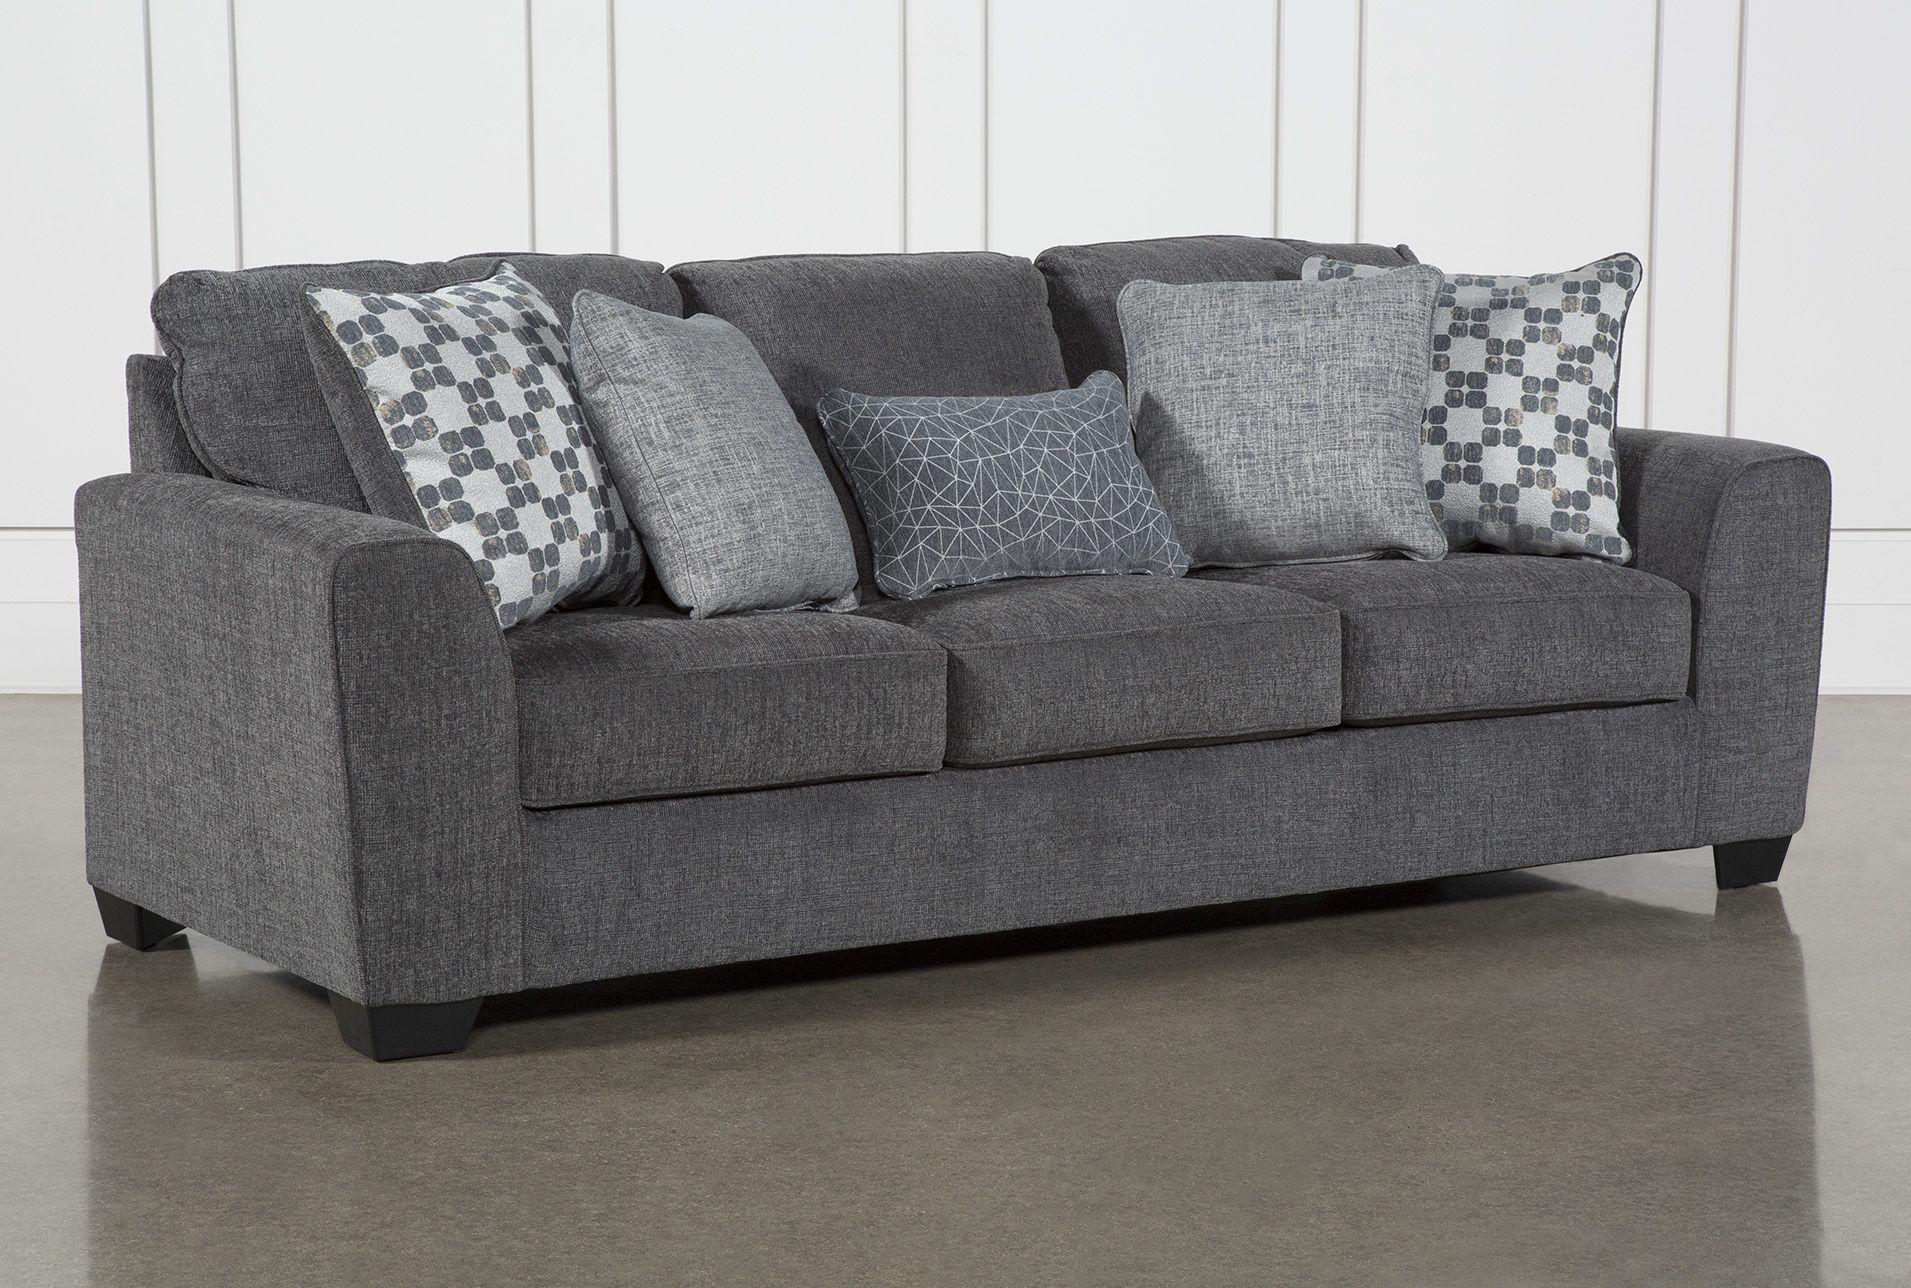 Awe Inspiring Banks Queen Sofa Sleeper Ncnpc Chair Design For Home Ncnpcorg